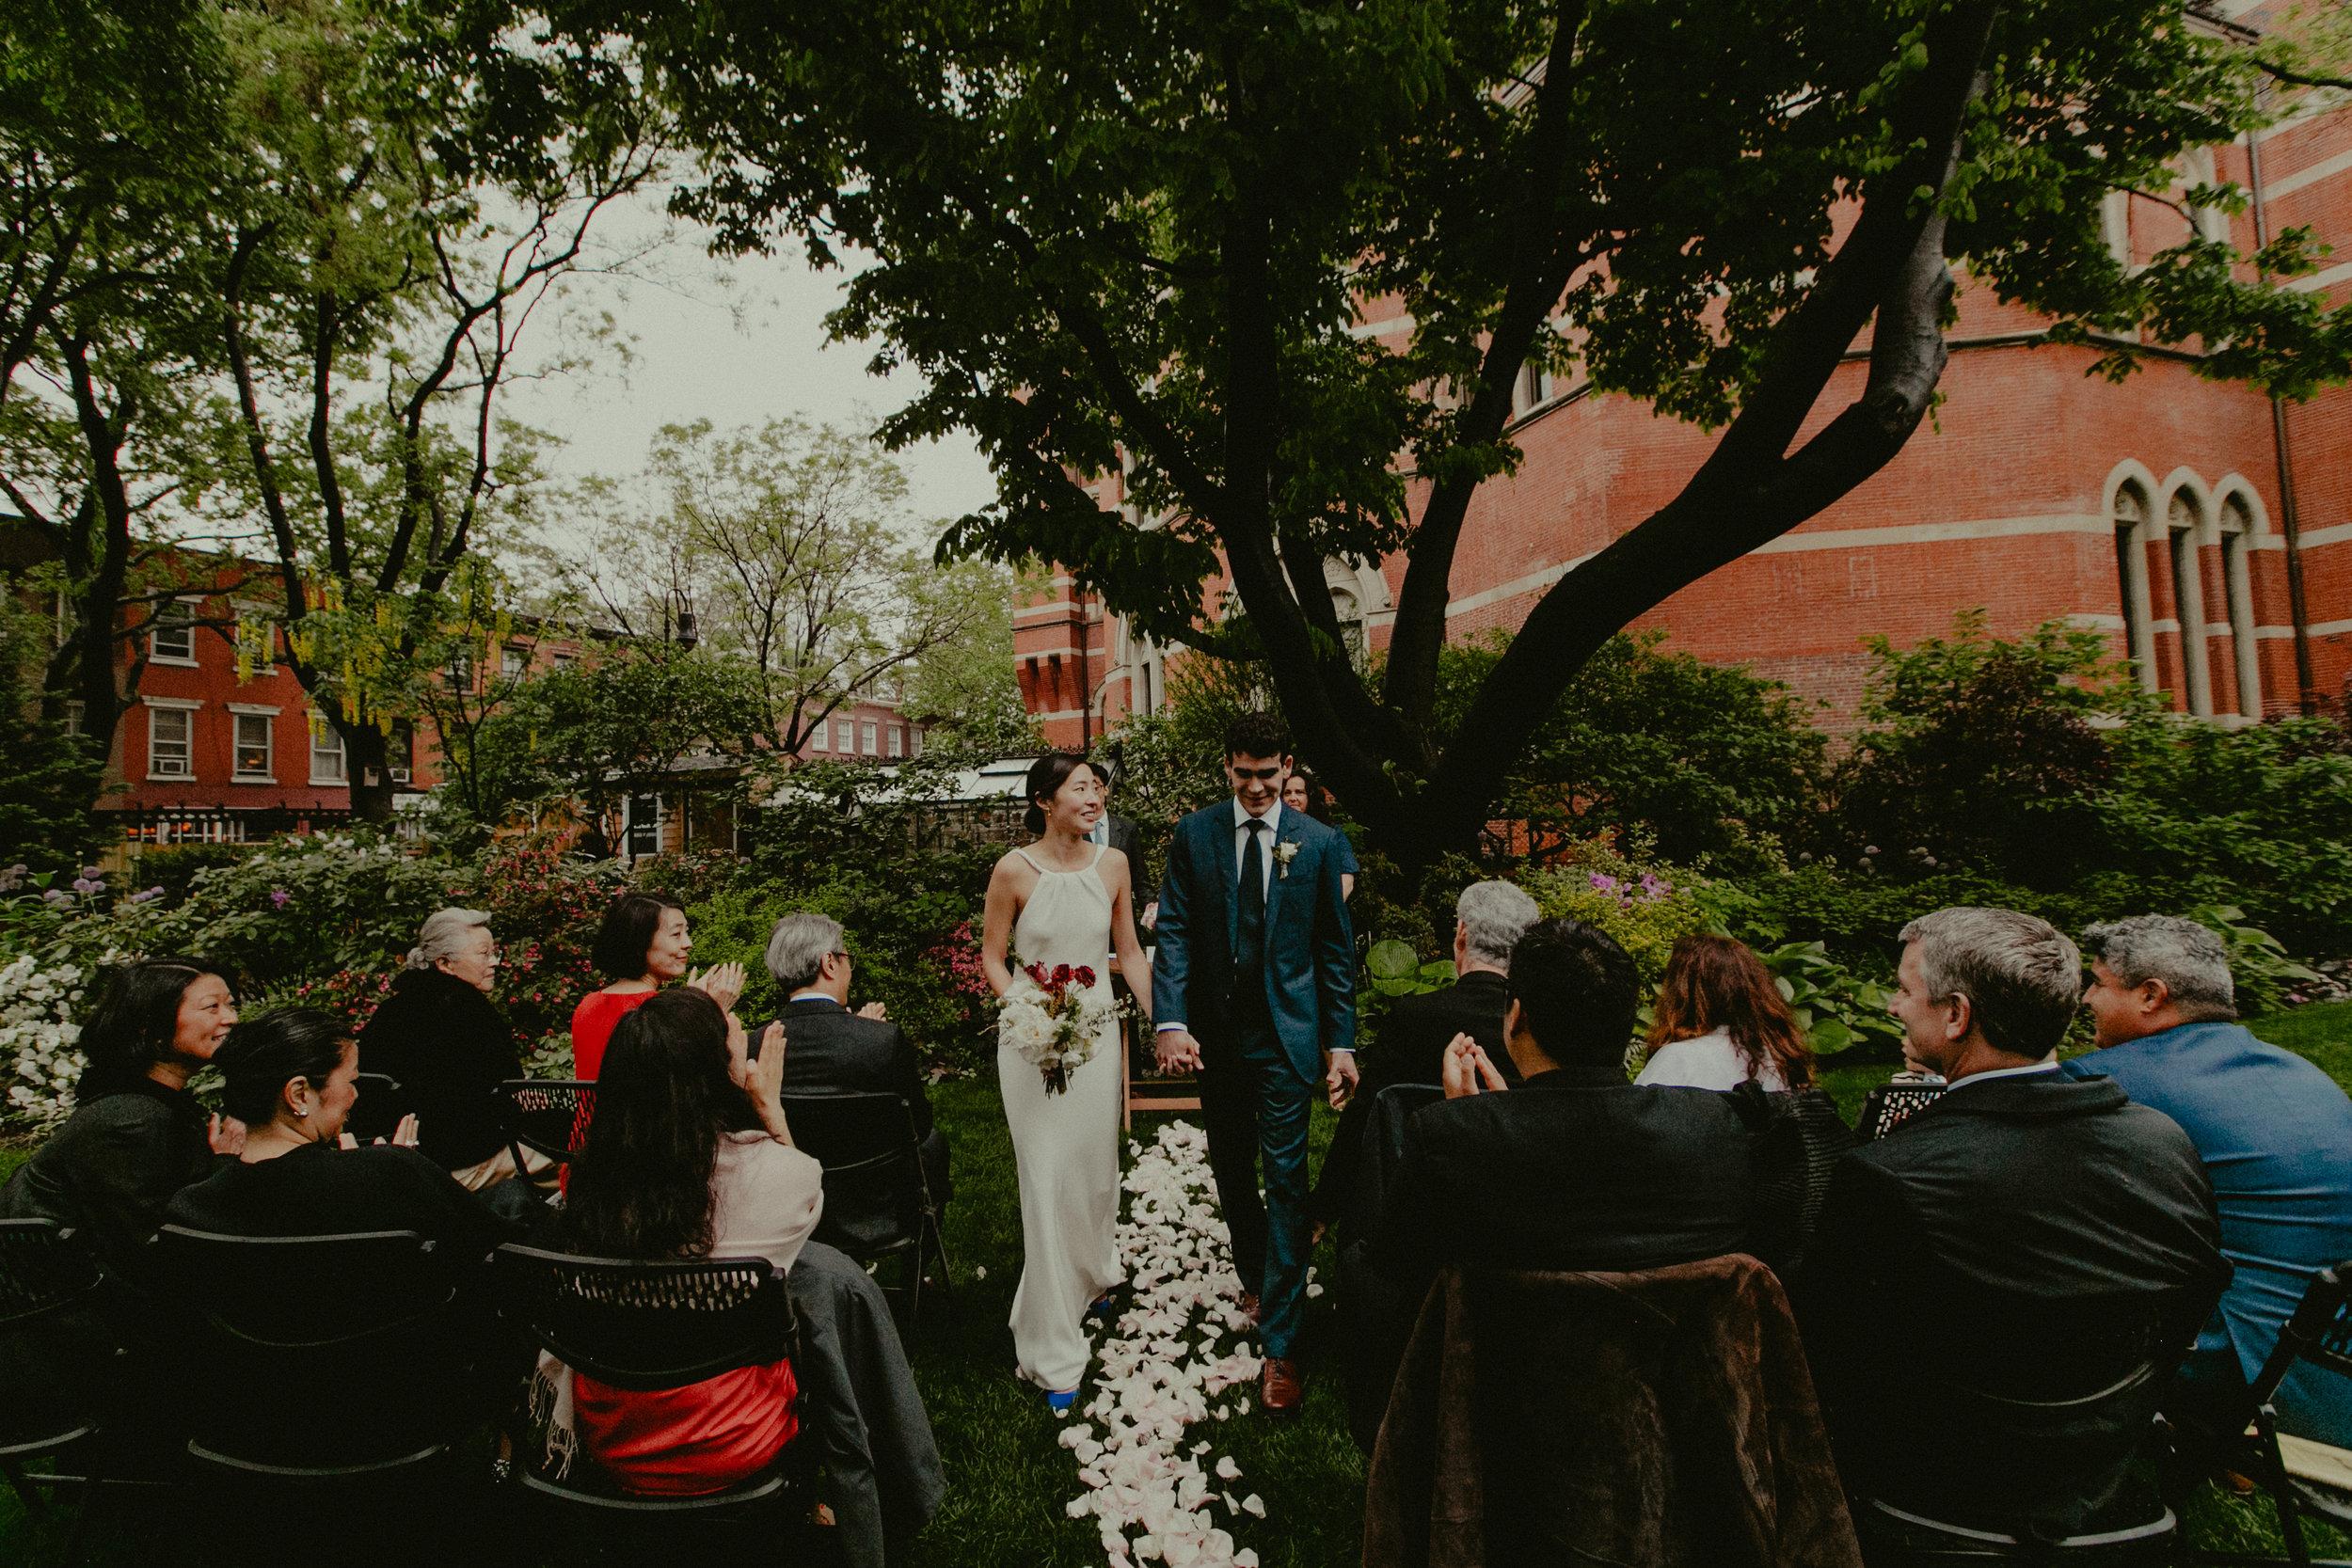 beekman hotel 468jefferson garden market wedding.JPG